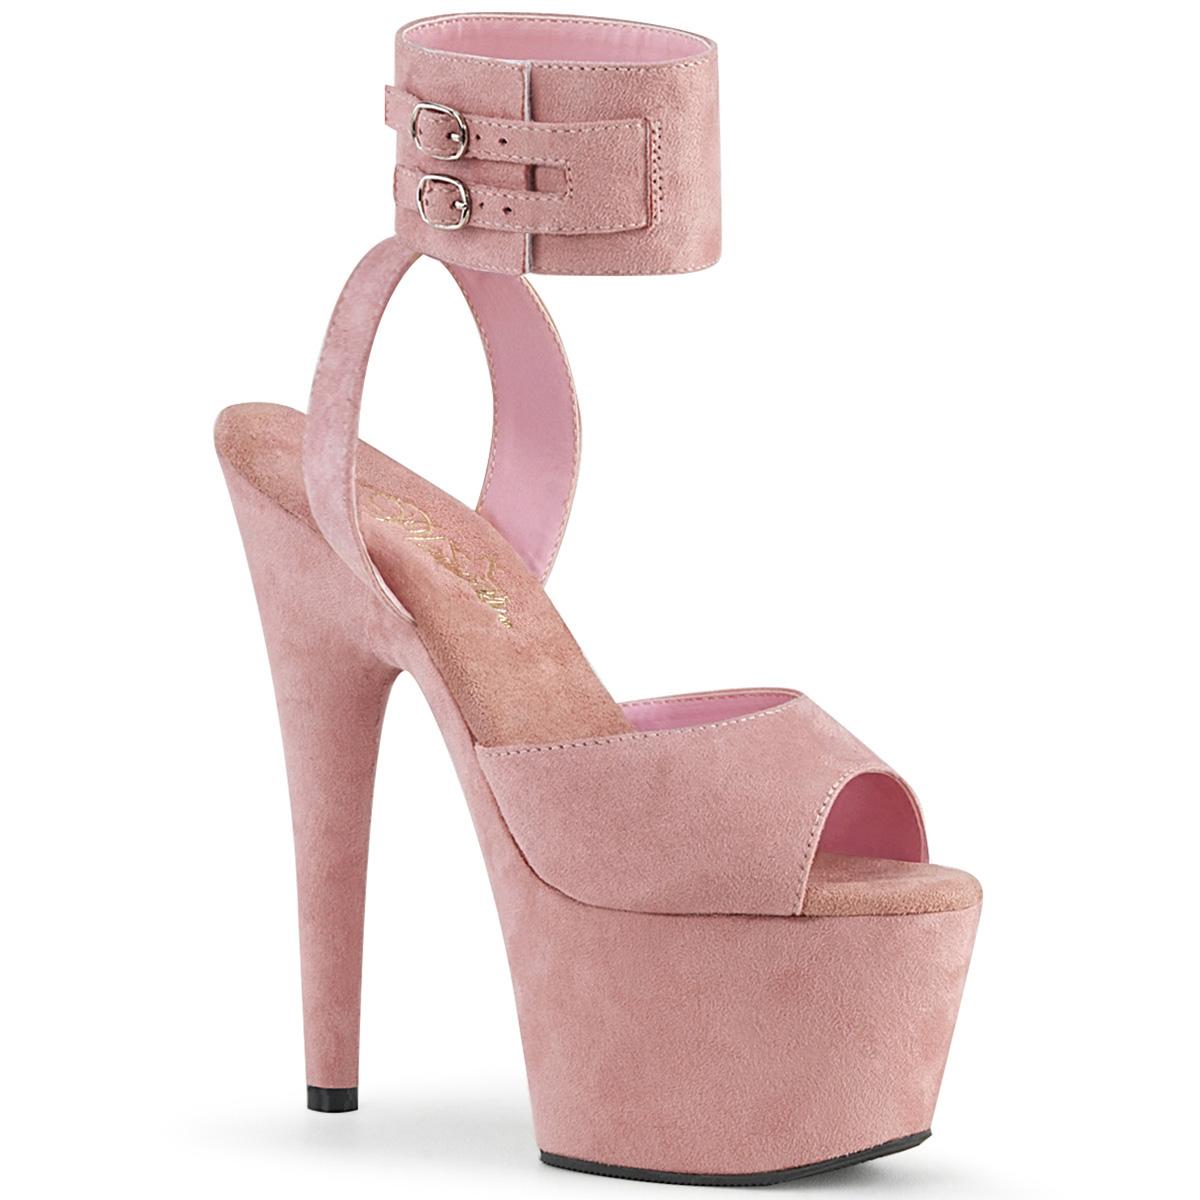 Platform High Heels ADORE-791FS - Baby